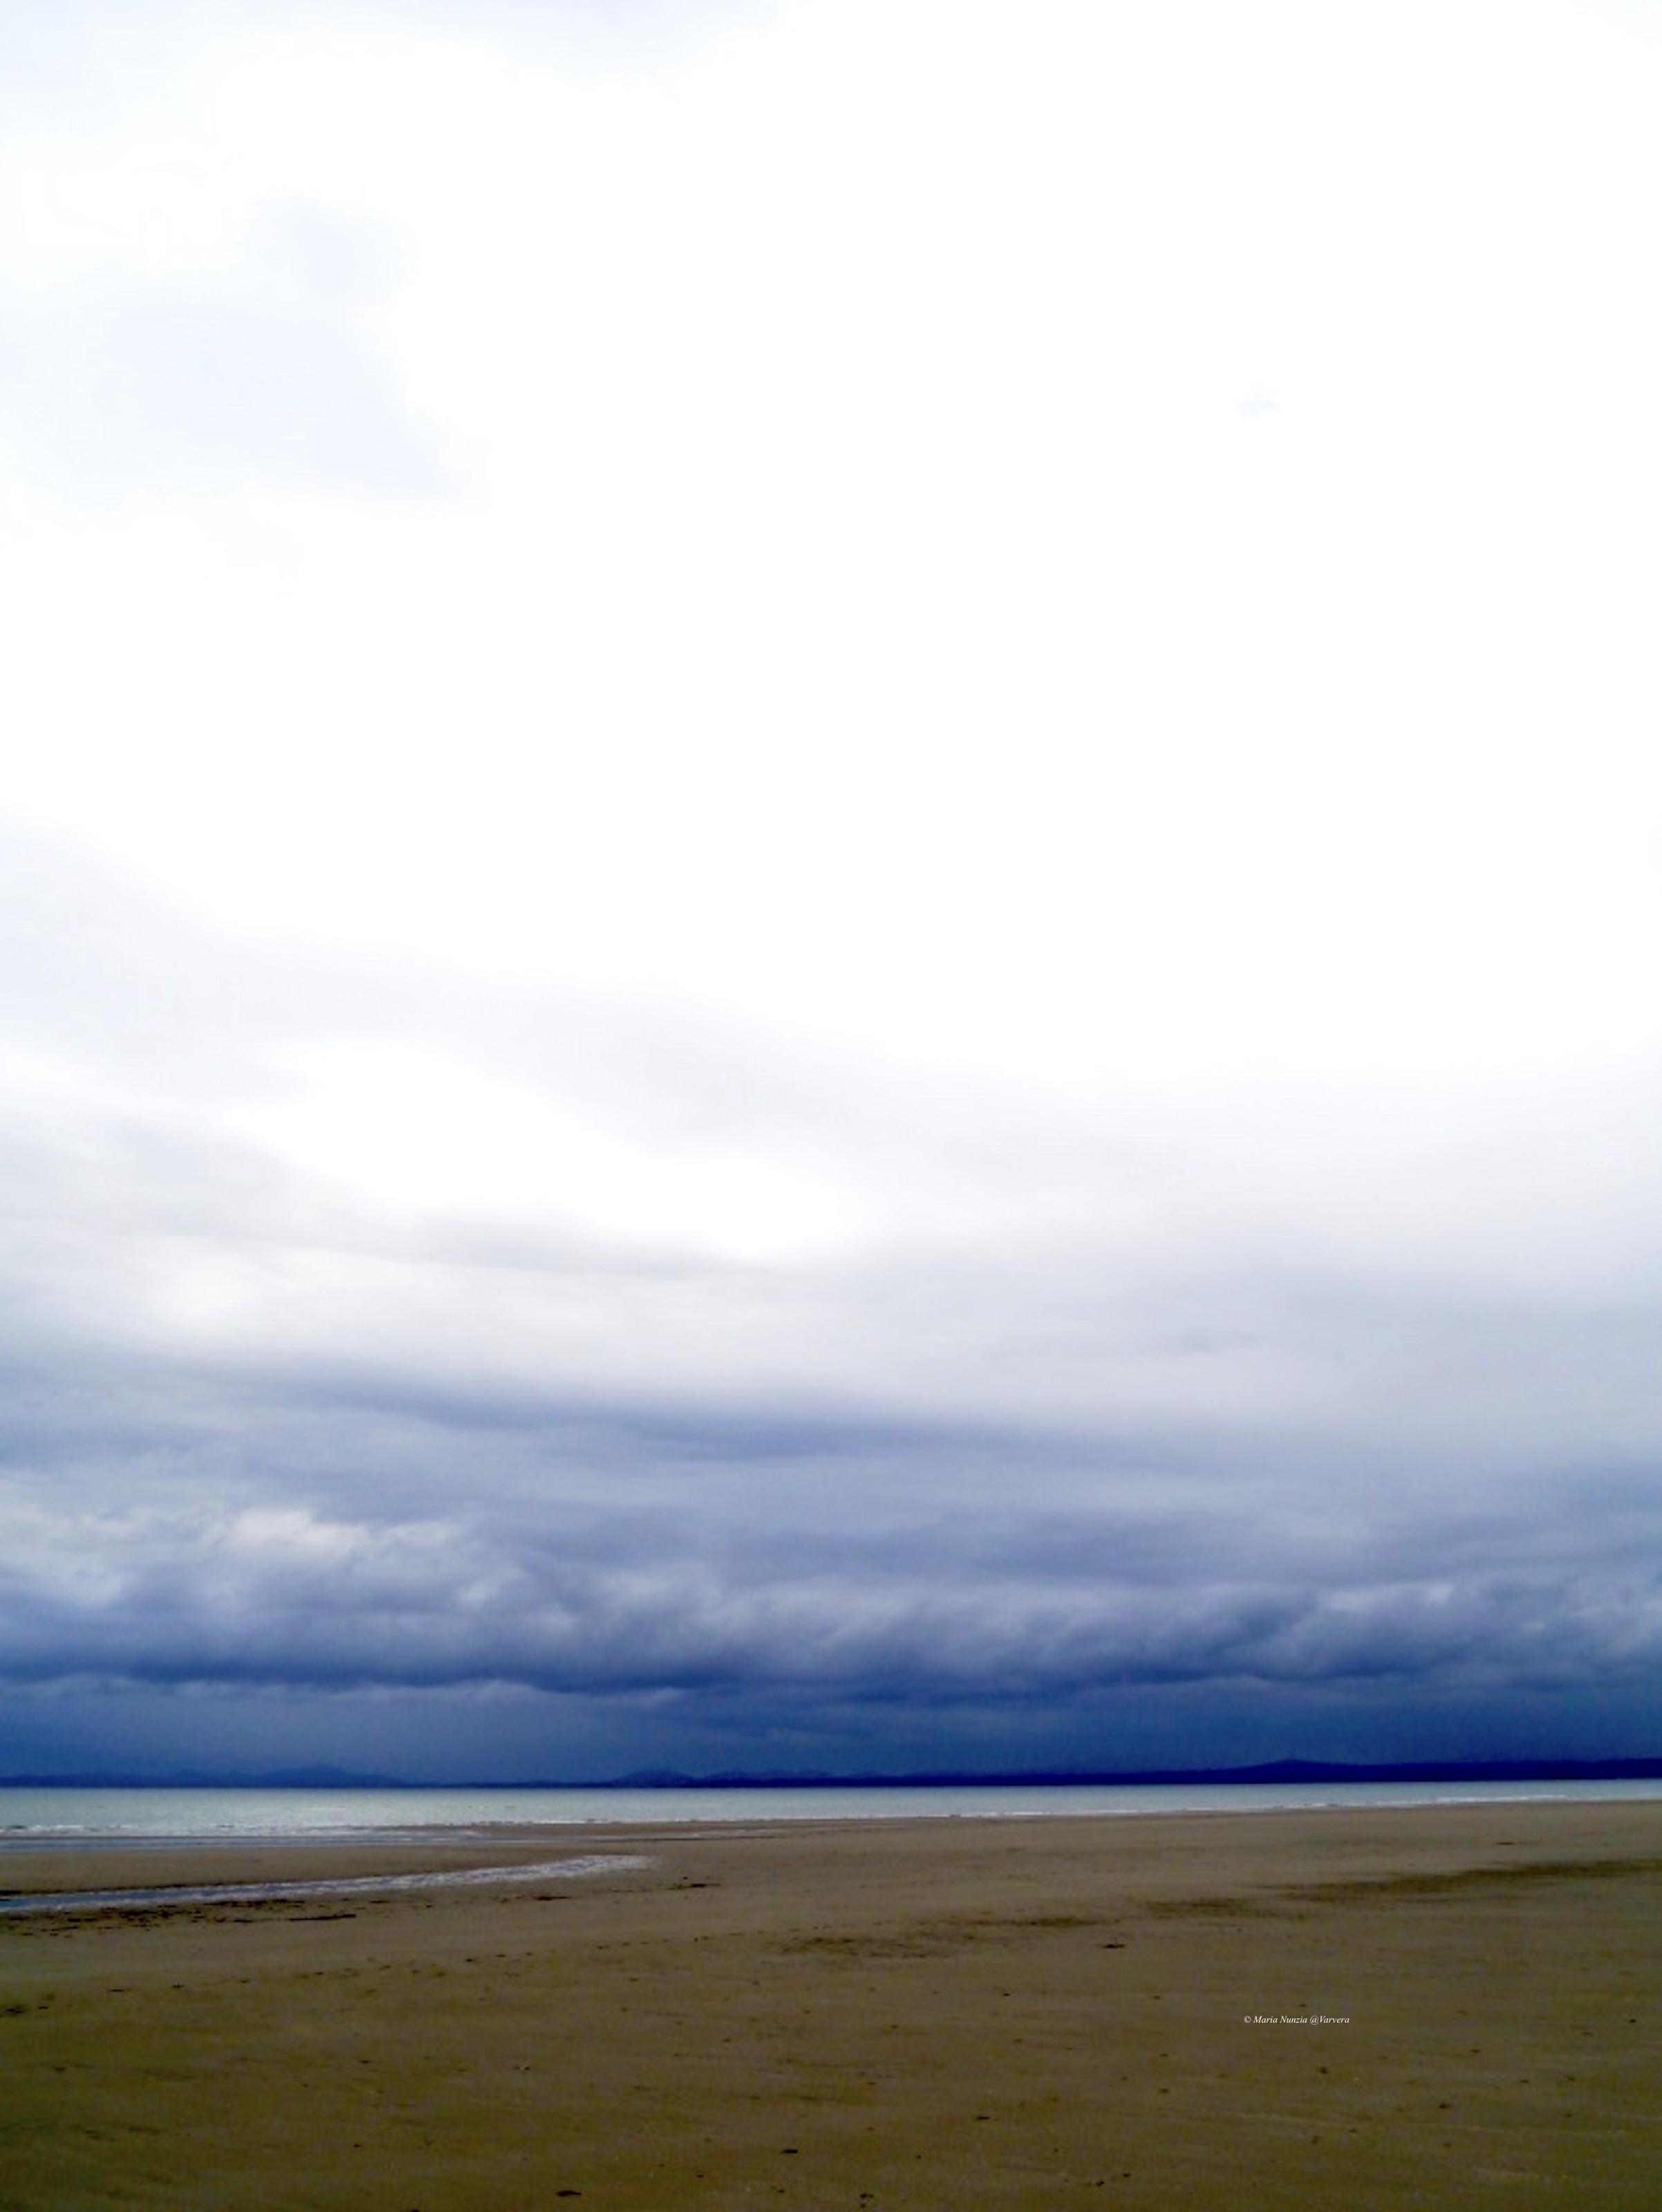 Morfa_Beach_©_Maria_Nunzia__Varvera_P1530506_1024_1024